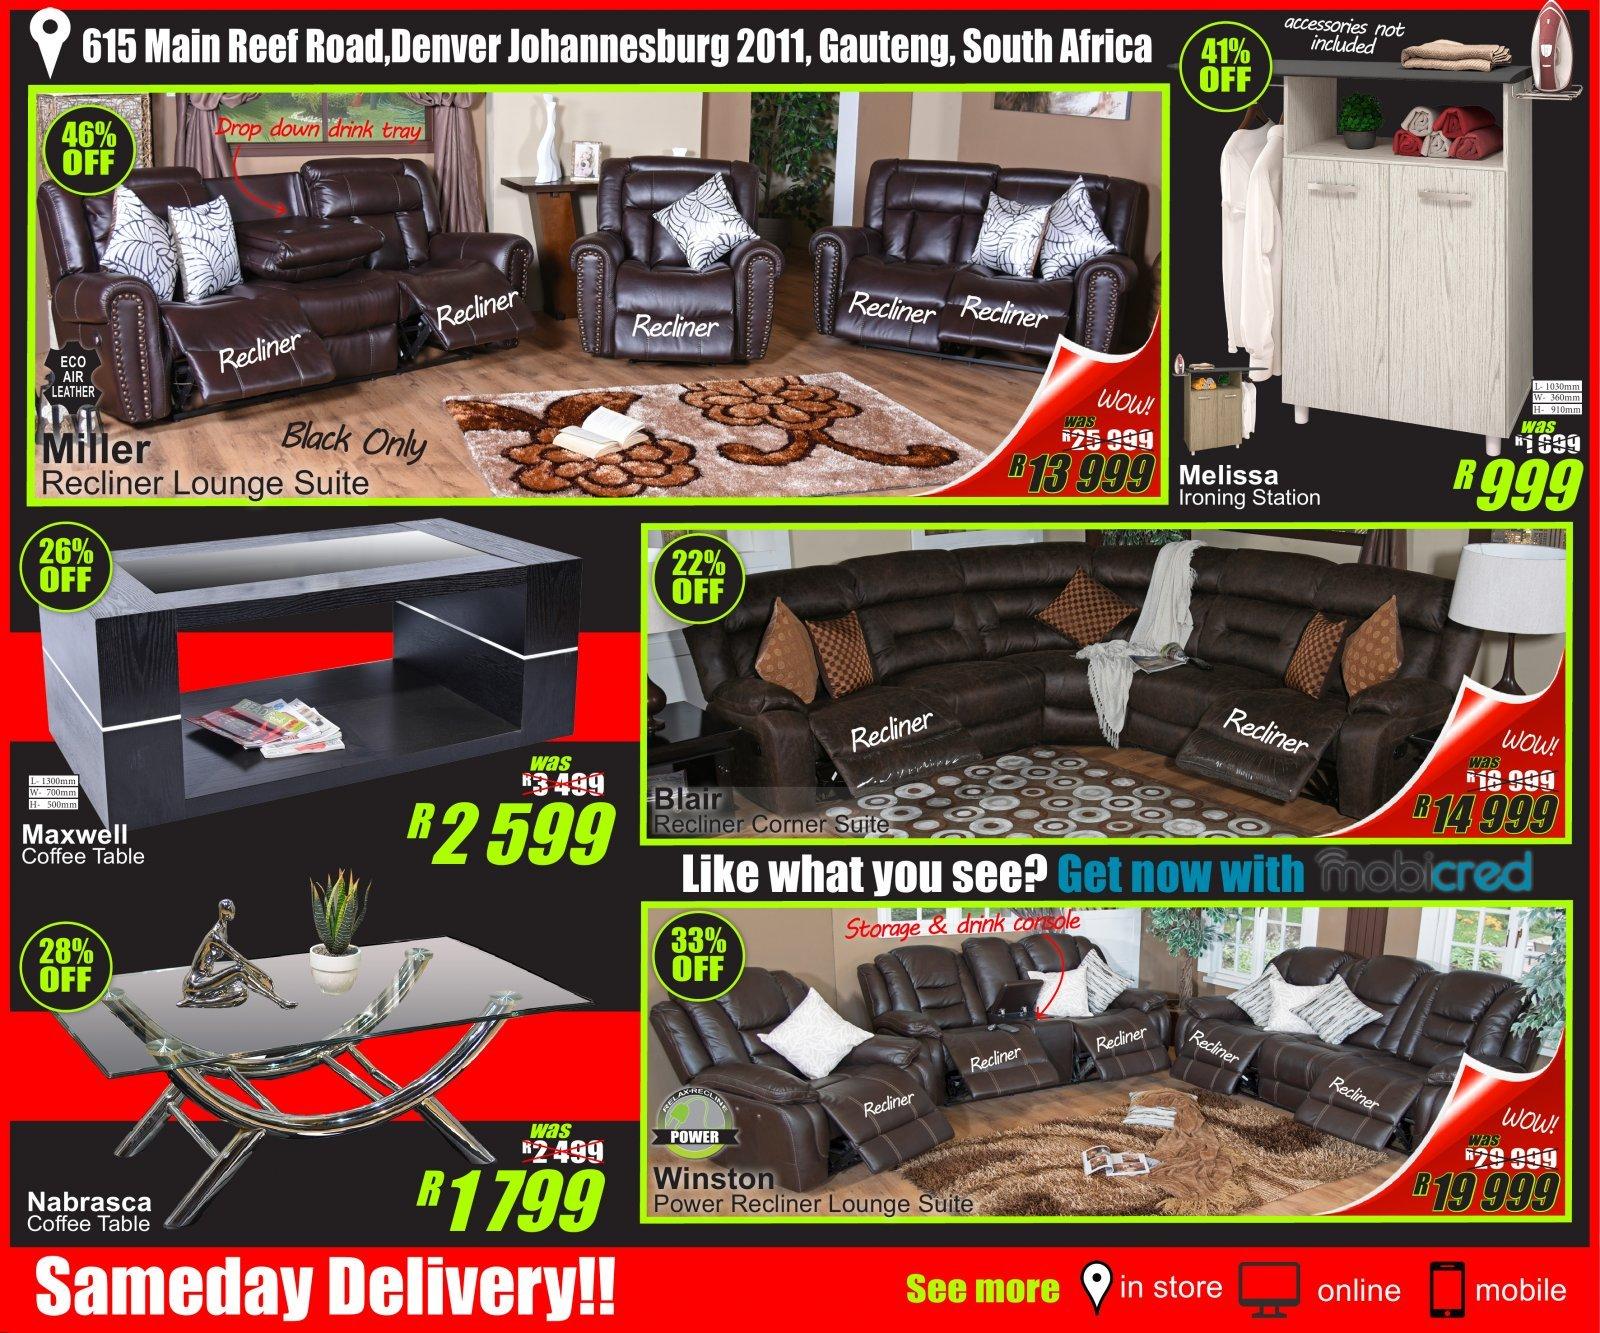 #BlackFriday Discount Decor Black Friday Deals (Prices